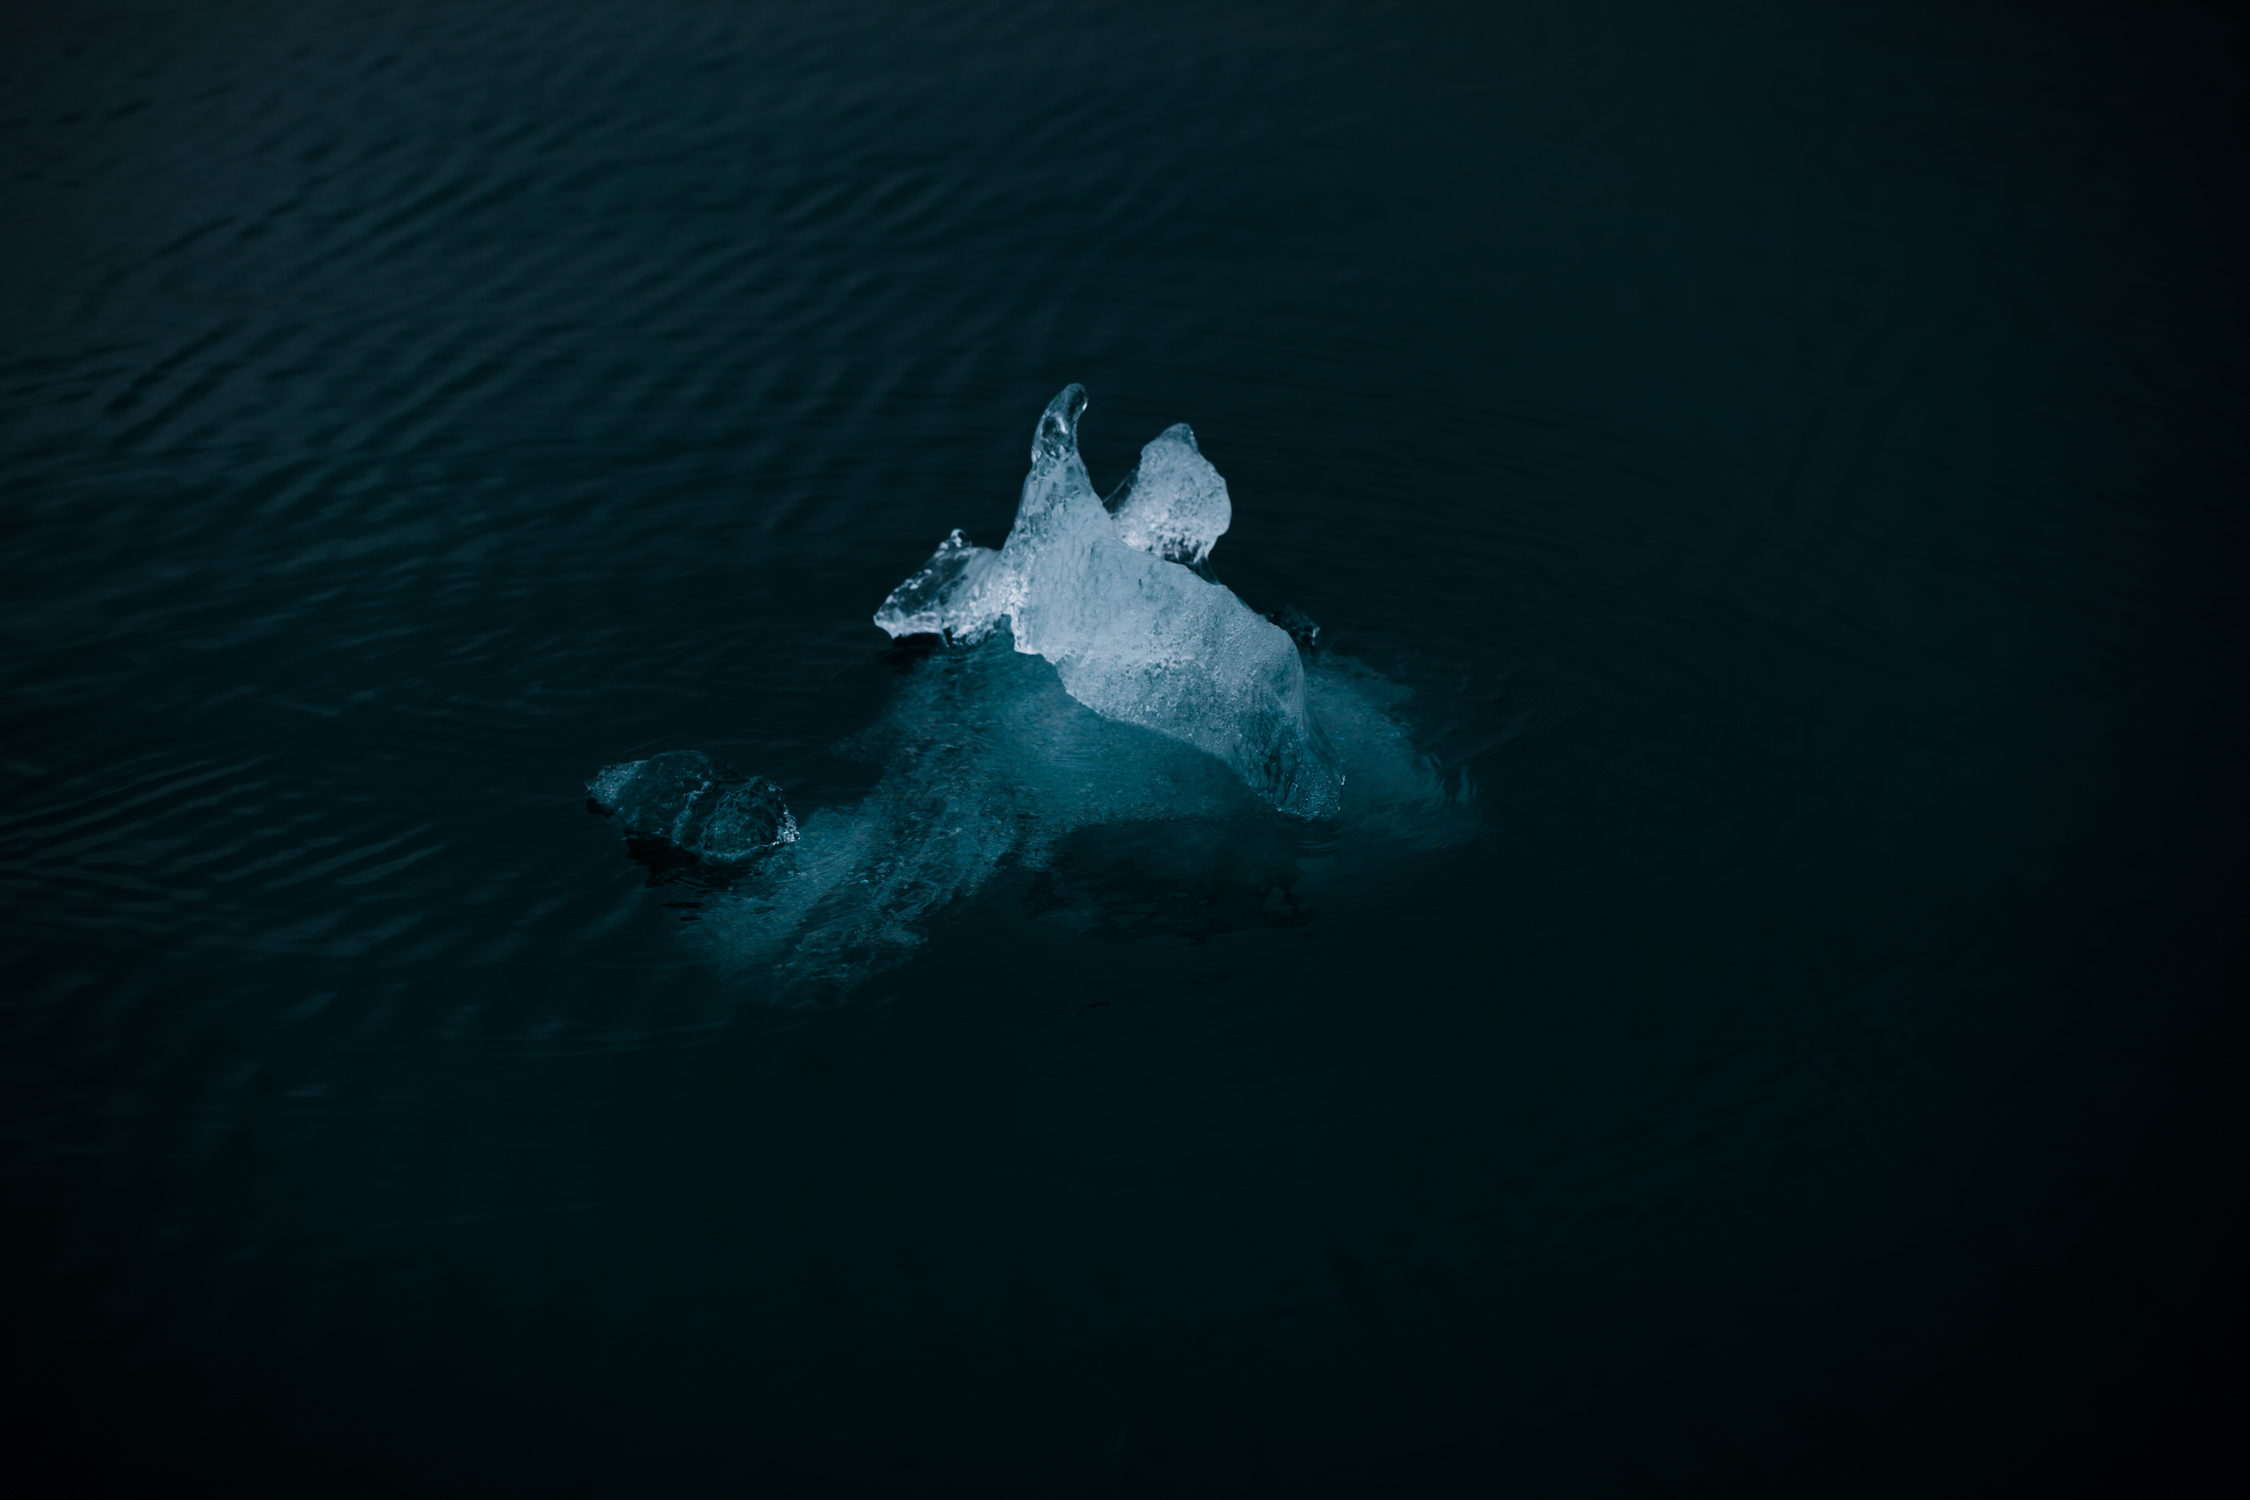 john-midgley-iceland-6.jpg